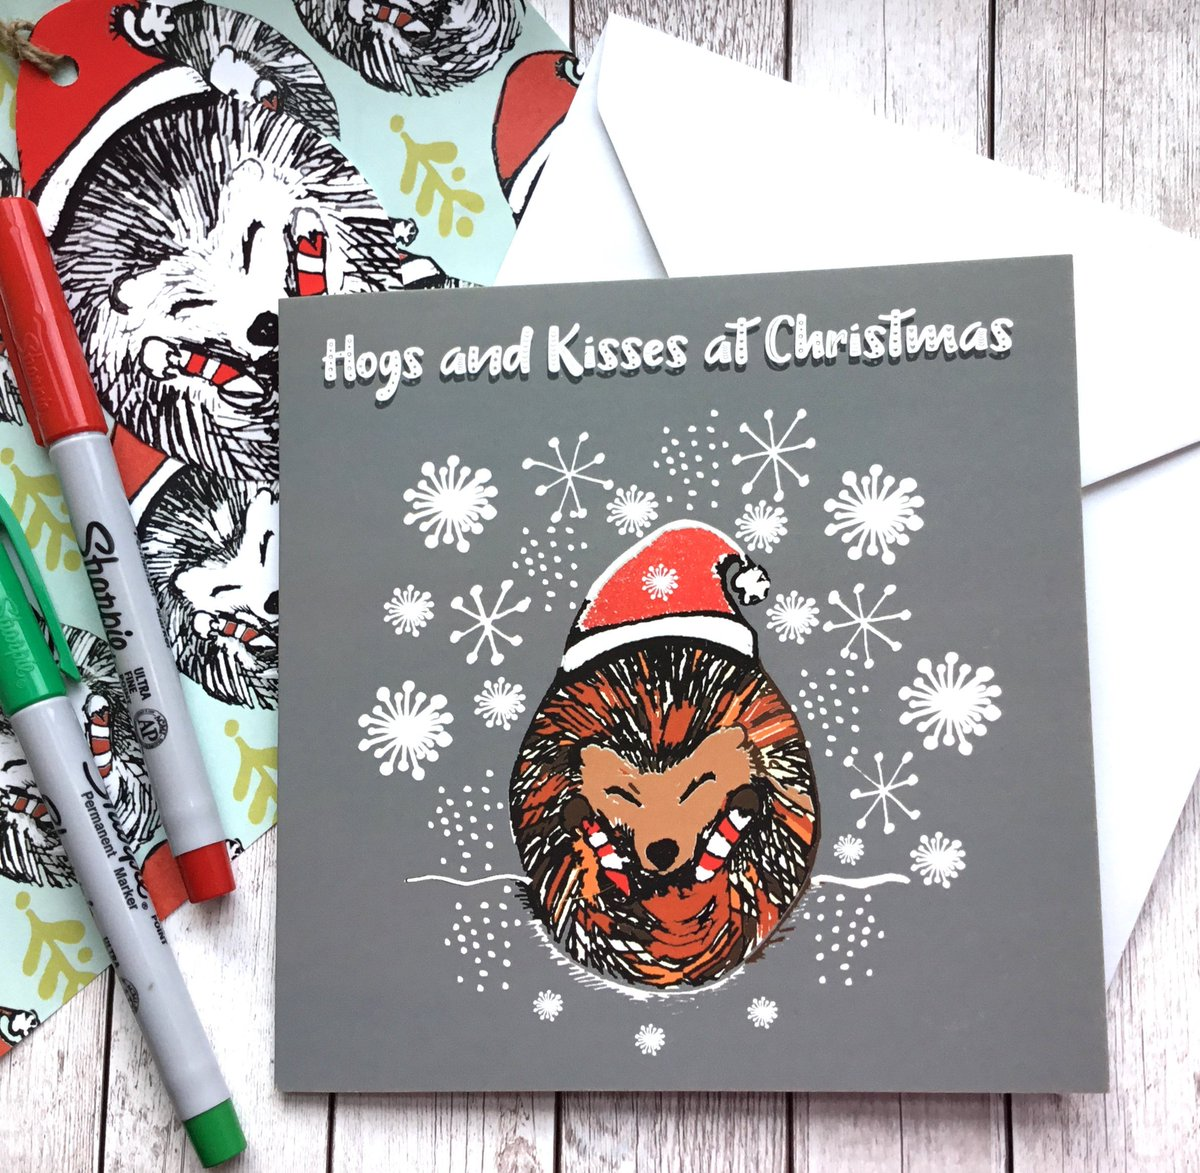 Slumbermonkey Design On Twitter Hedgehog Christmas Card Hogs And